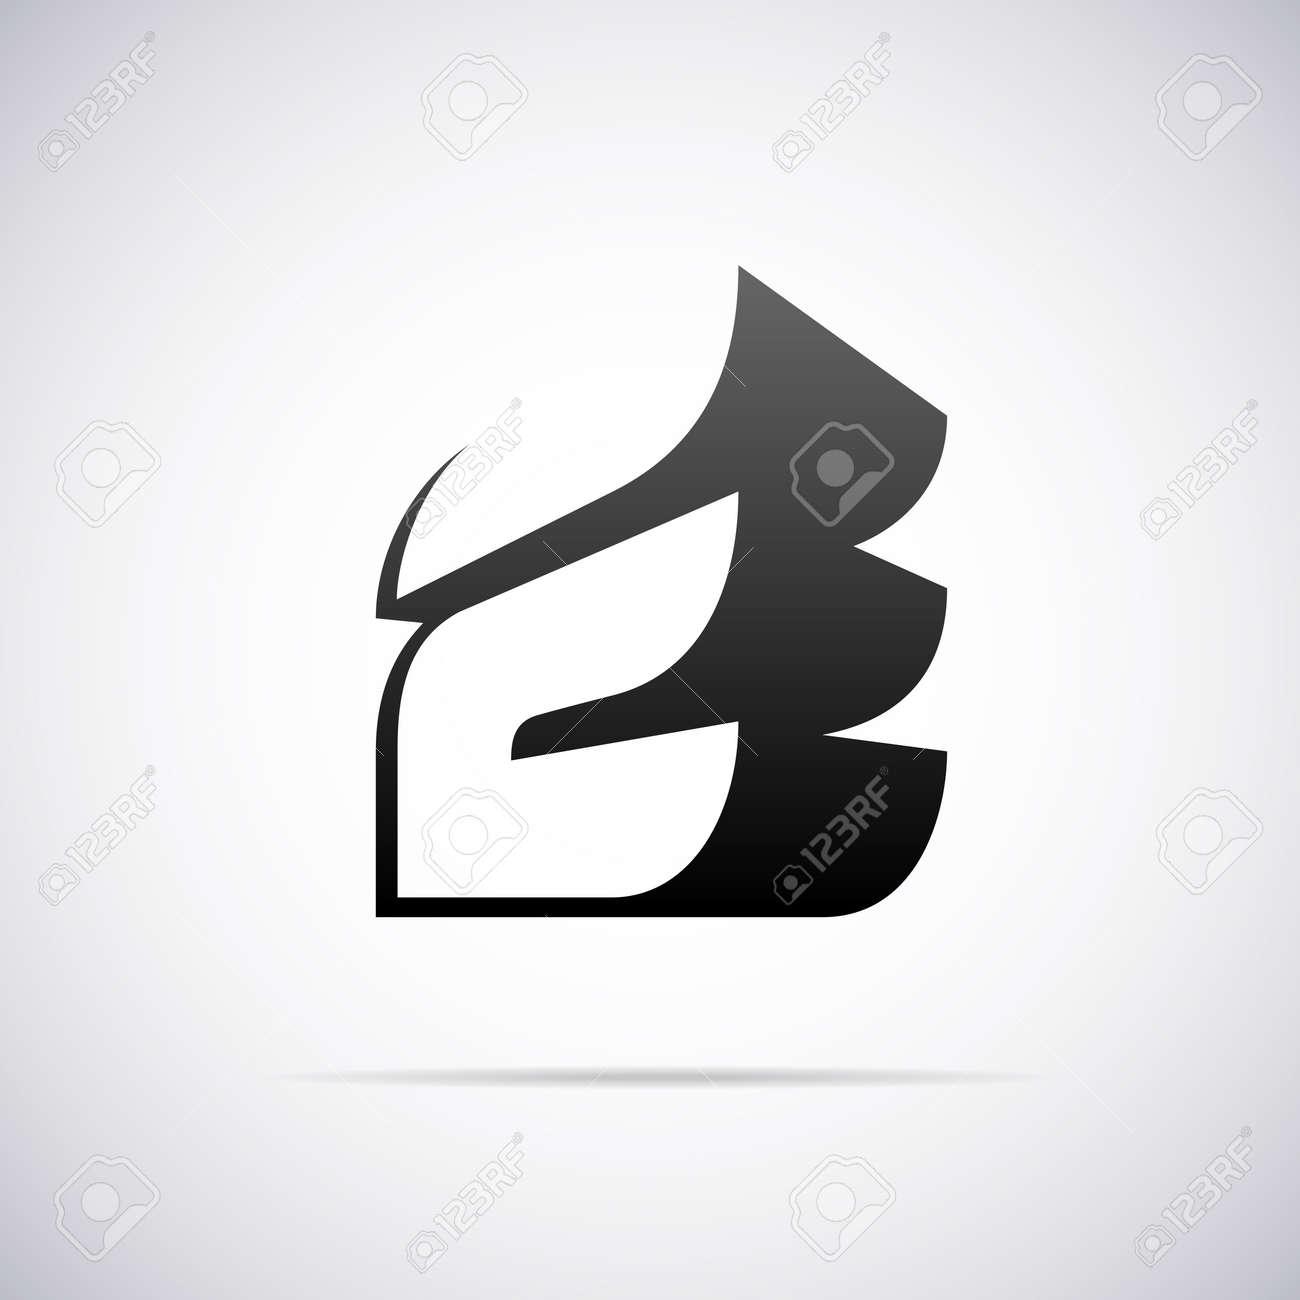 Logo for letter e design template vector illustration royalty free logo for letter e design template vector illustration stock vector 43081909 spiritdancerdesigns Images